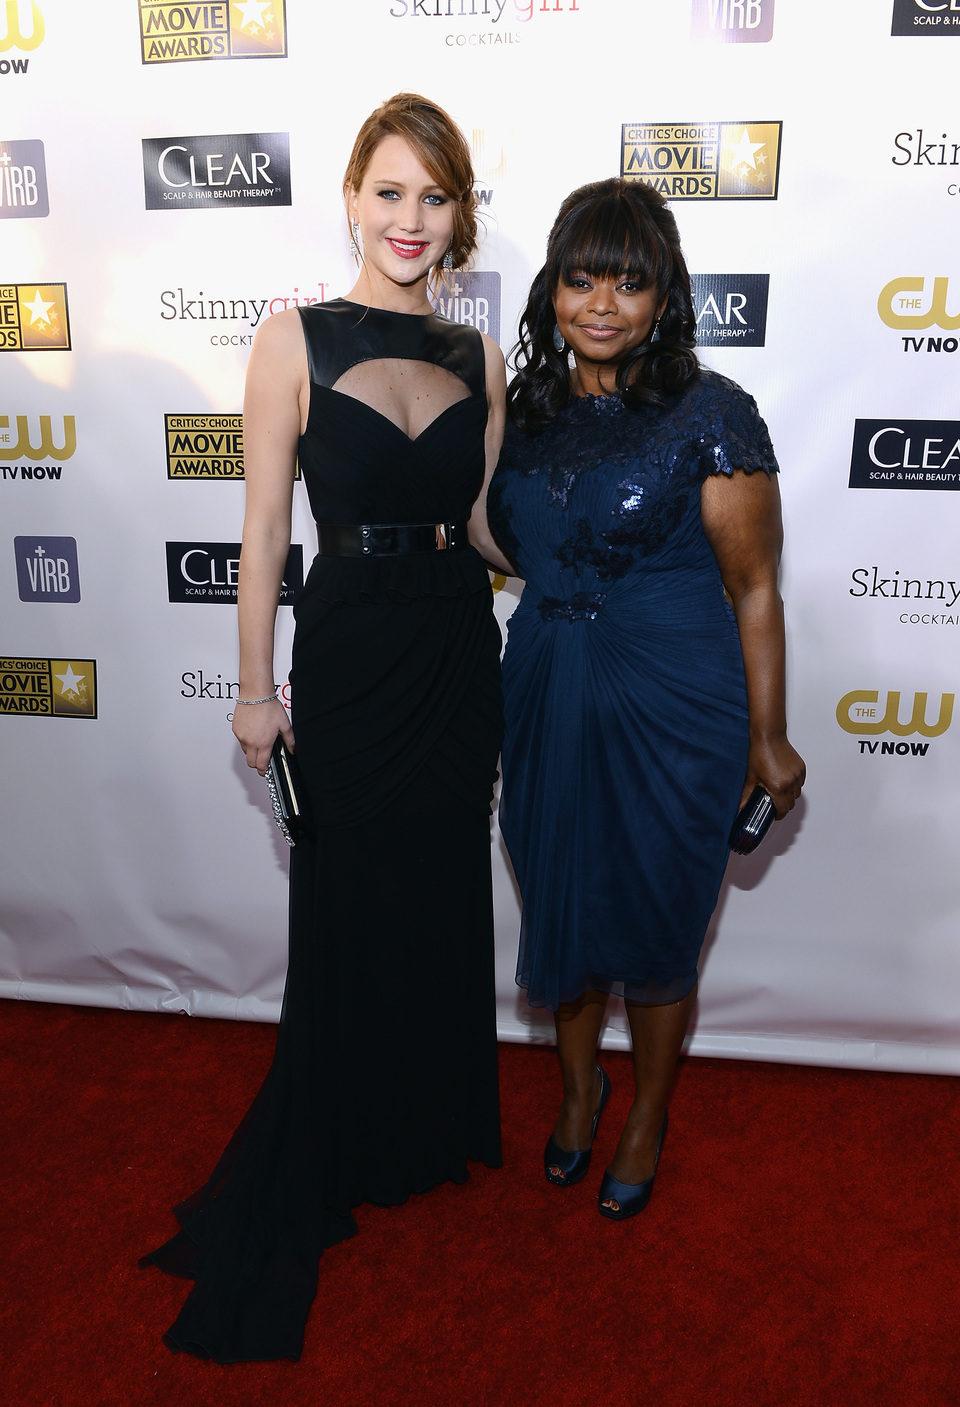 Jennifer Lawrence y Octavia Spencer en los Critics' Choice Movie Awards 2013